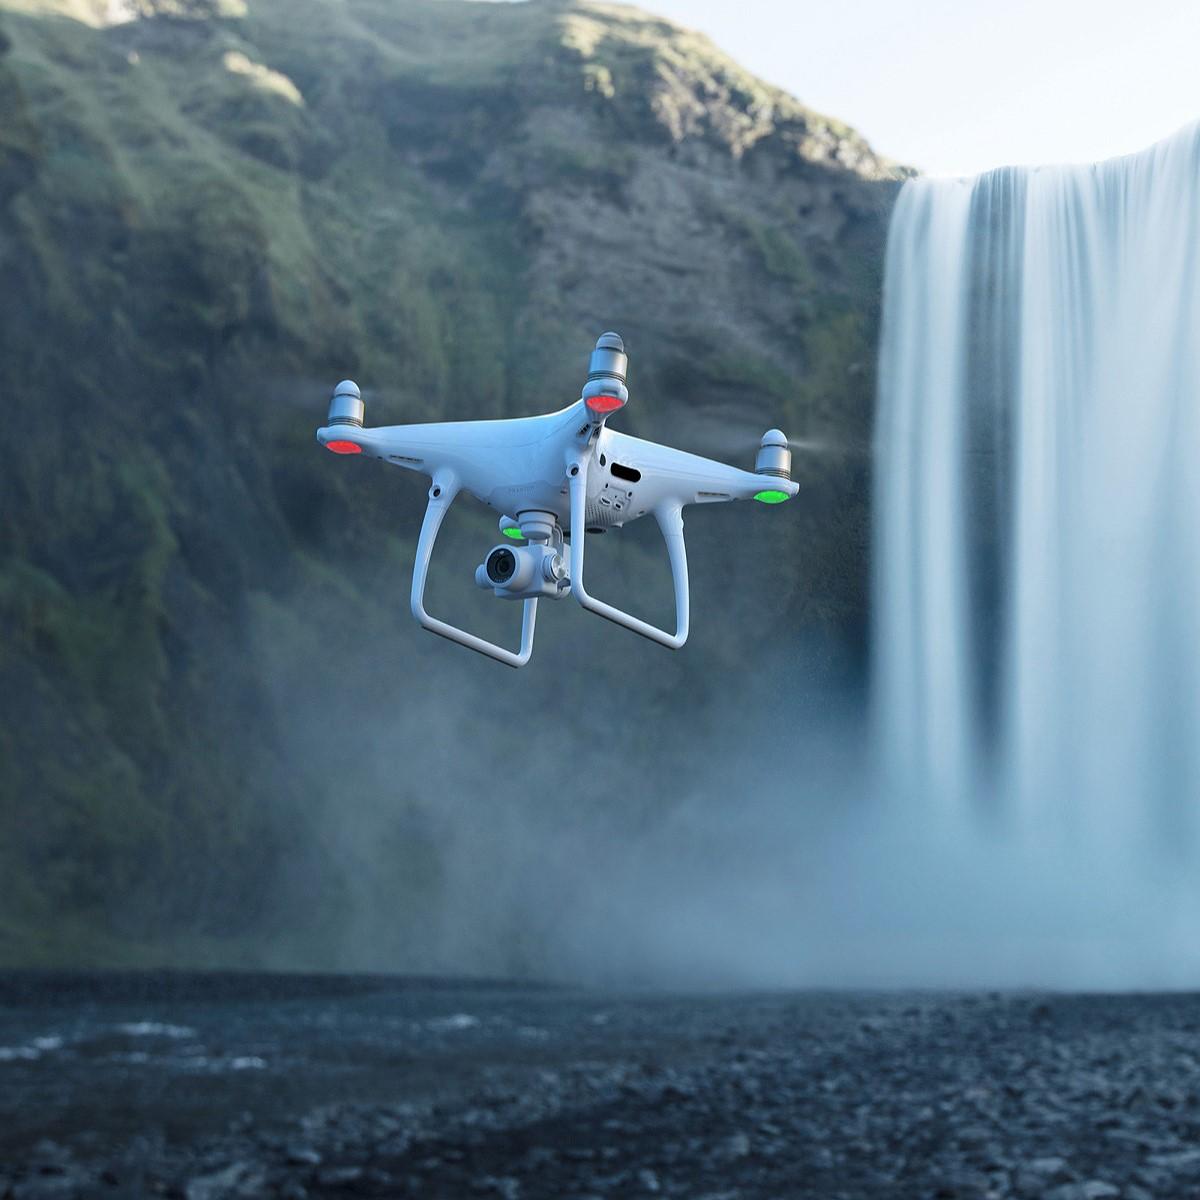 8 x Drone Propeller Blades For Phantom 4 PRO Advanced Design Quick Release P4